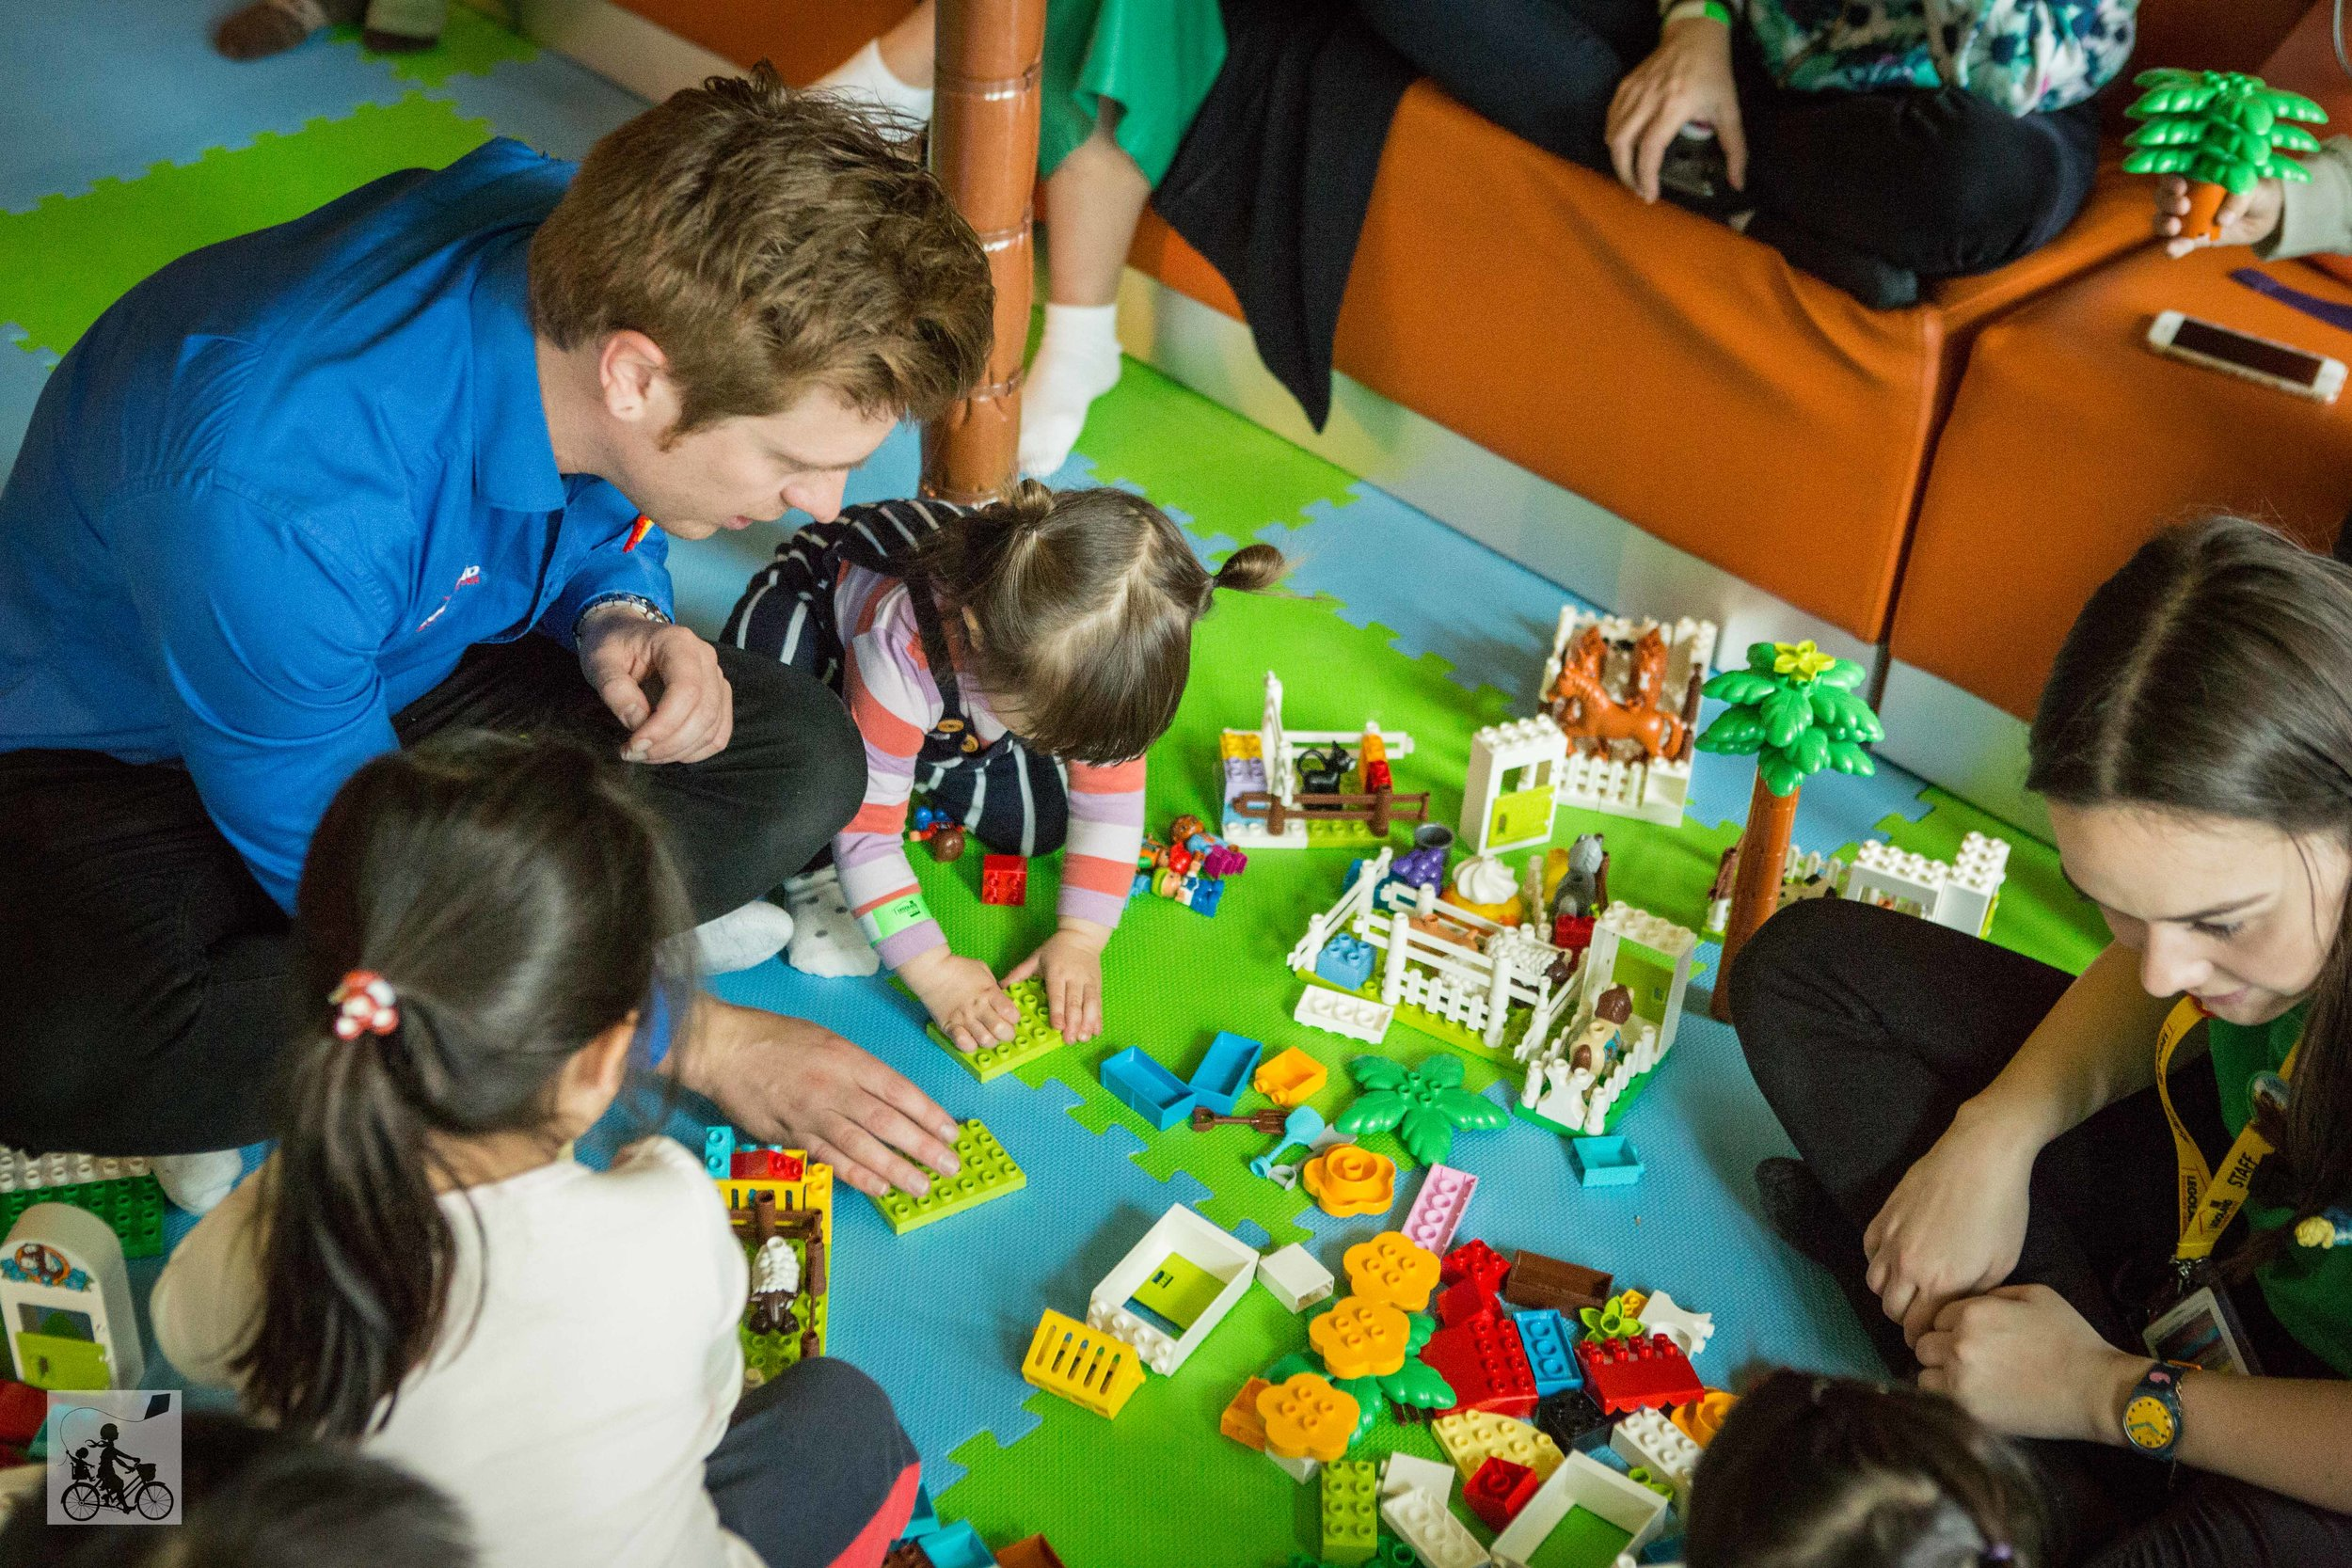 LEGOland Farm Adventure - Mamma Knows East (34 of 34).jpg